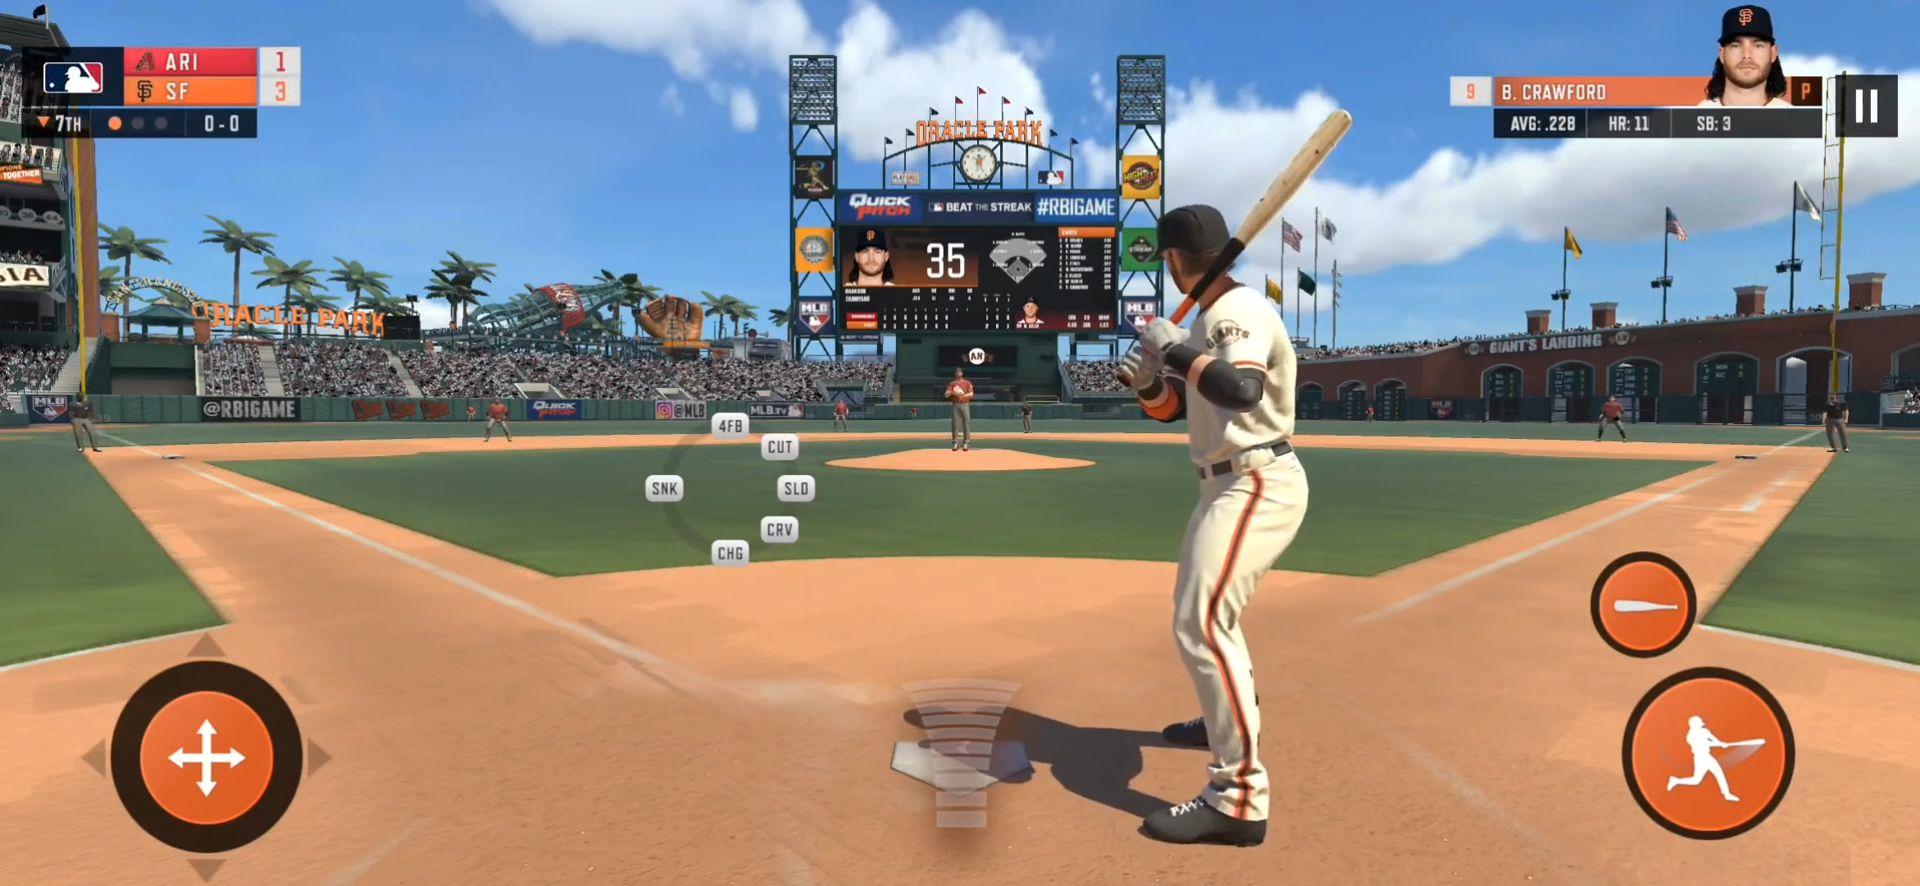 Android用 R.B.I. Baseball 20